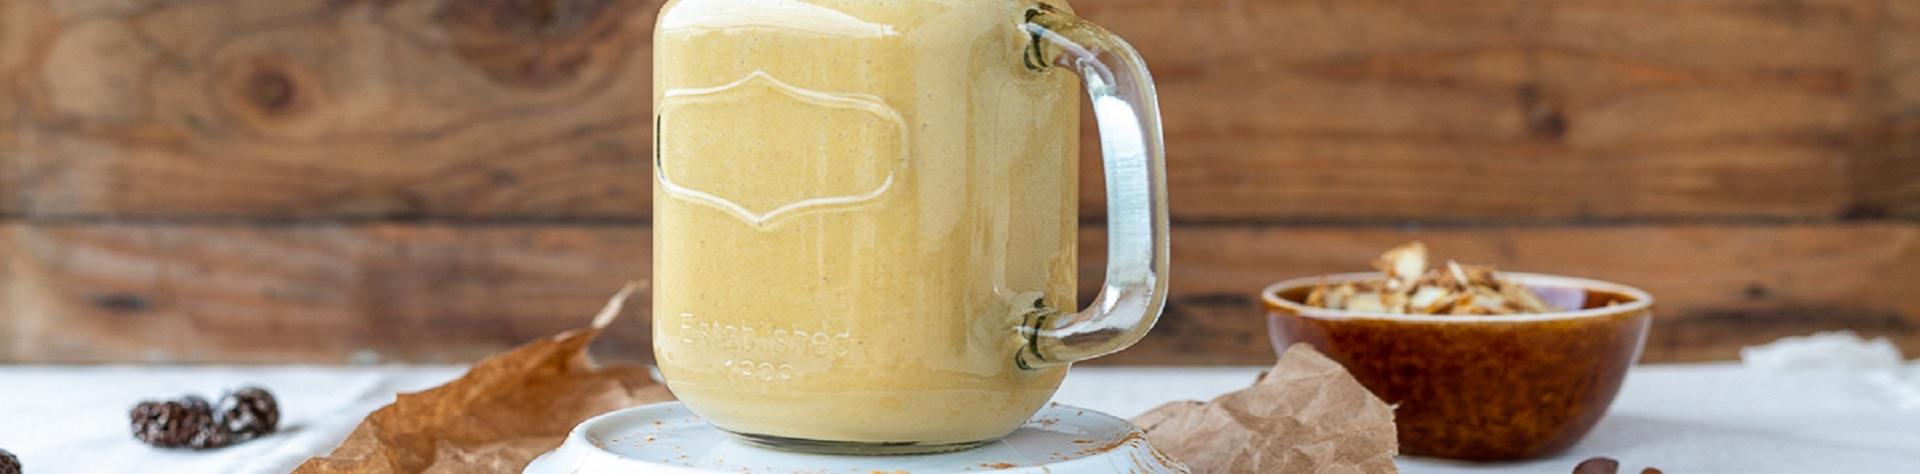 Kürbis-Latte